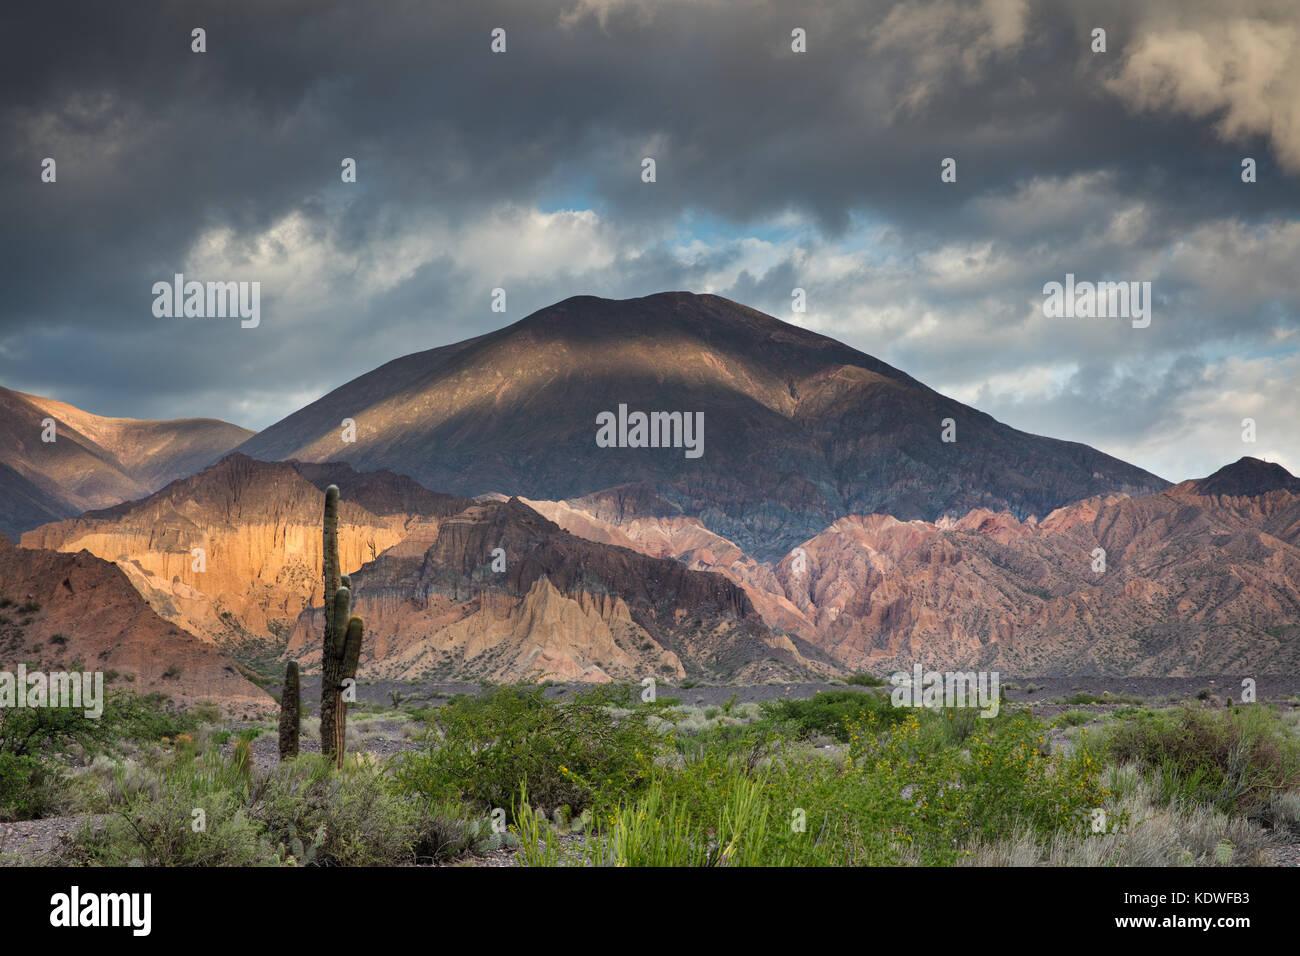 Dawn on the hills of  the Quebrada de Humahuacha nr Maimara, Jujuy Province, Argentina - Stock Image